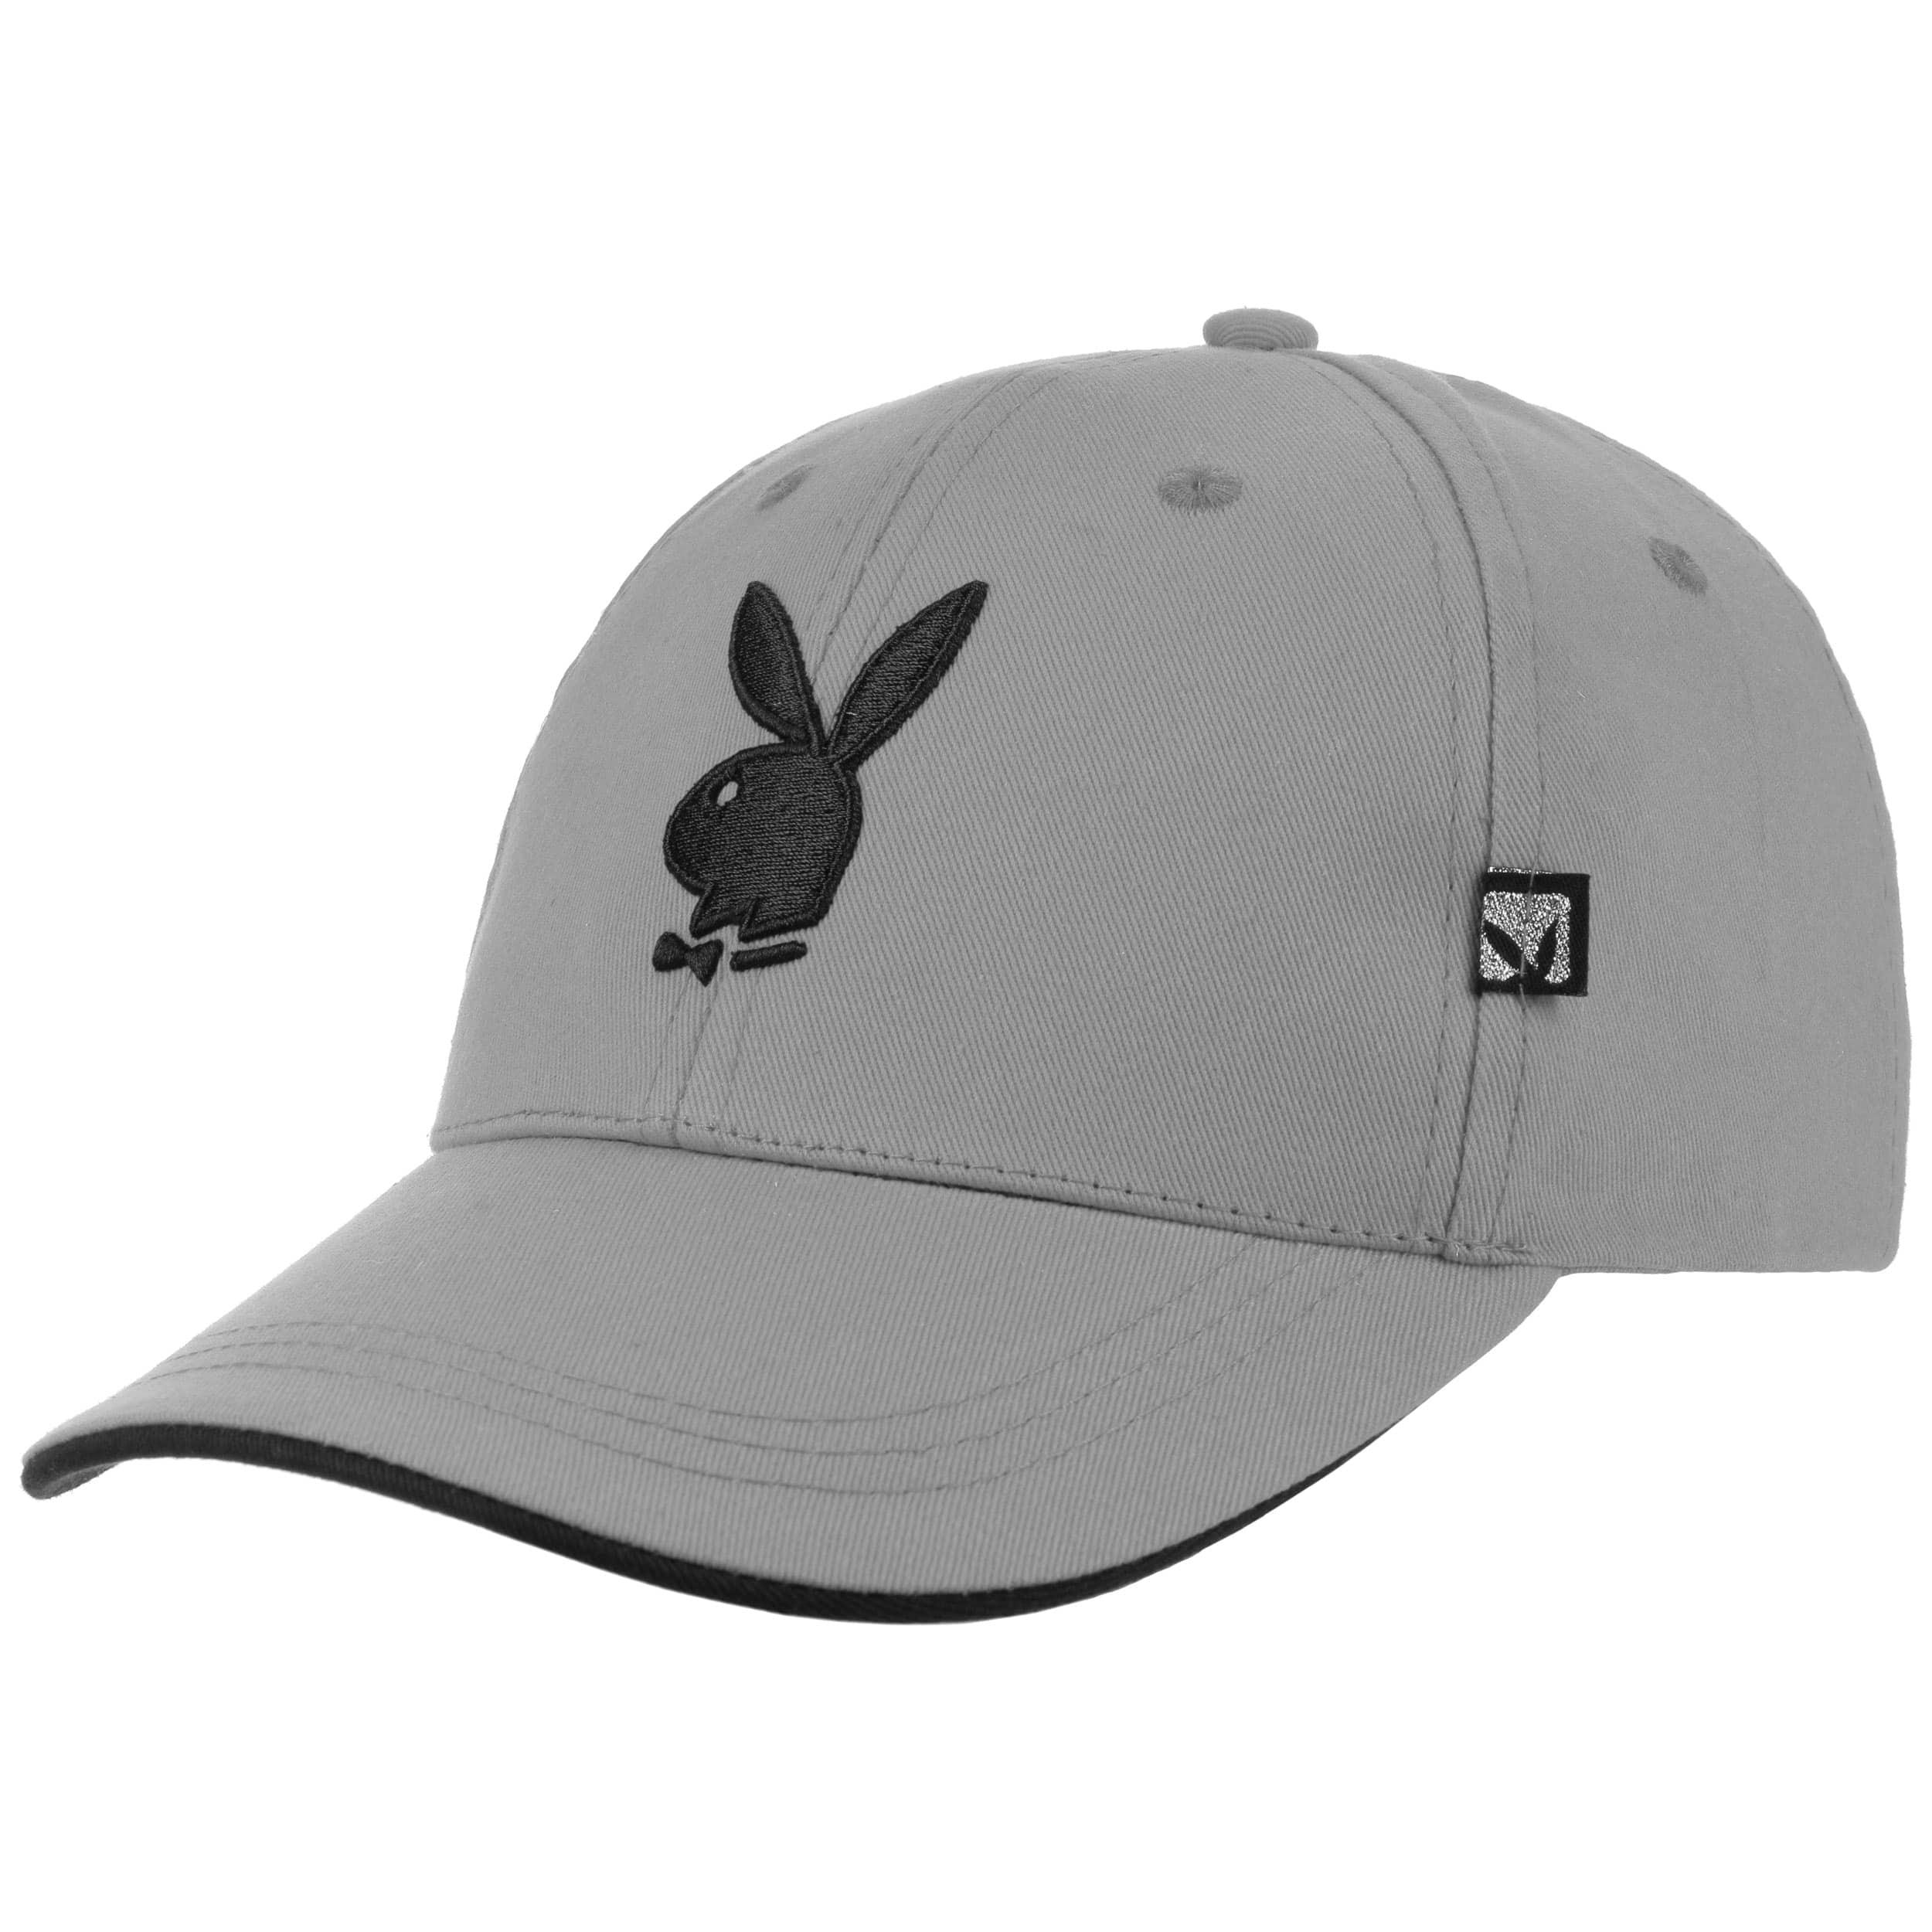 Bunny Cappellino Classic 19 € Playboy 95 eBodrCx